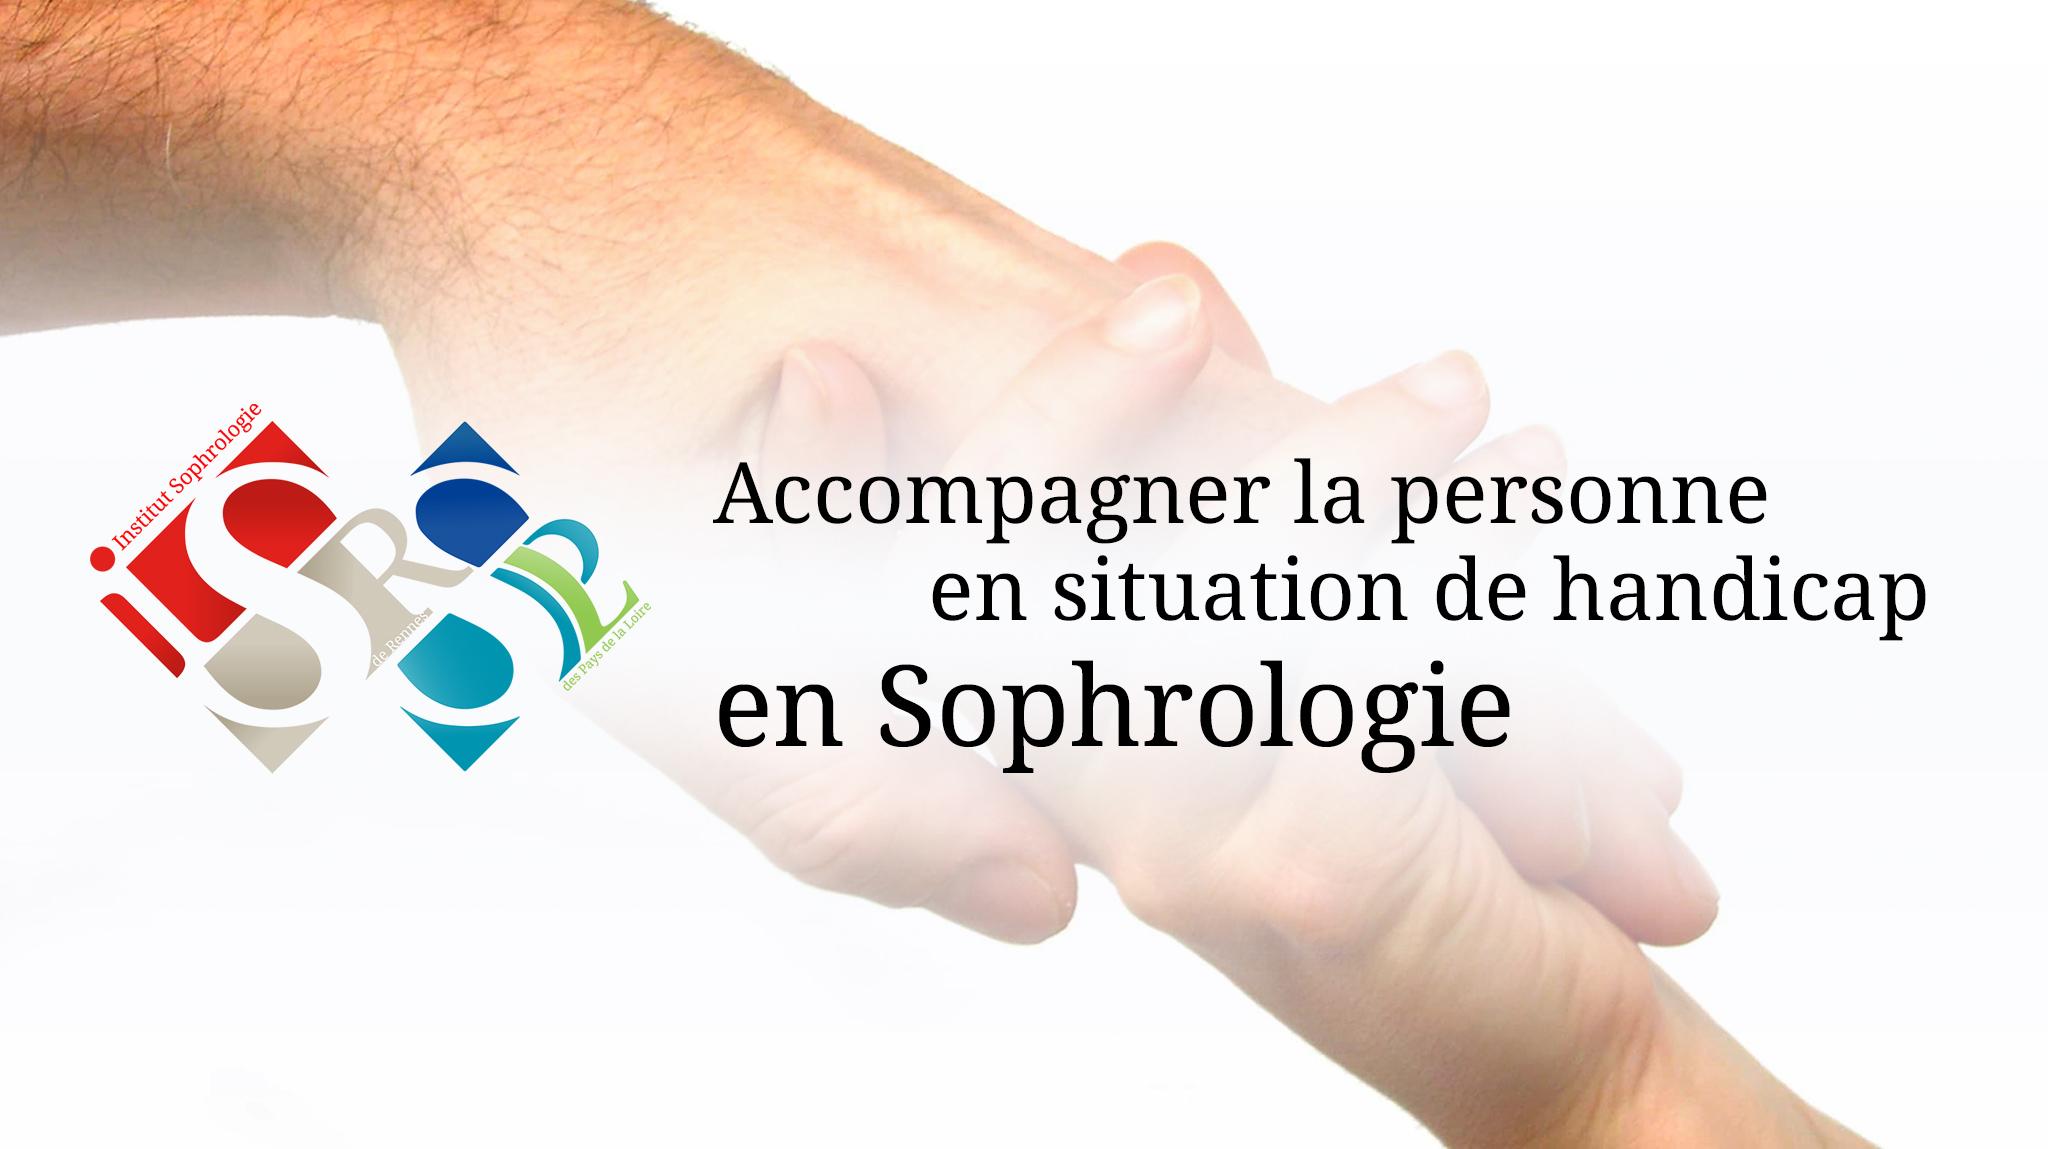 Accompagner les personnes en situation de handicap en Sophrologie